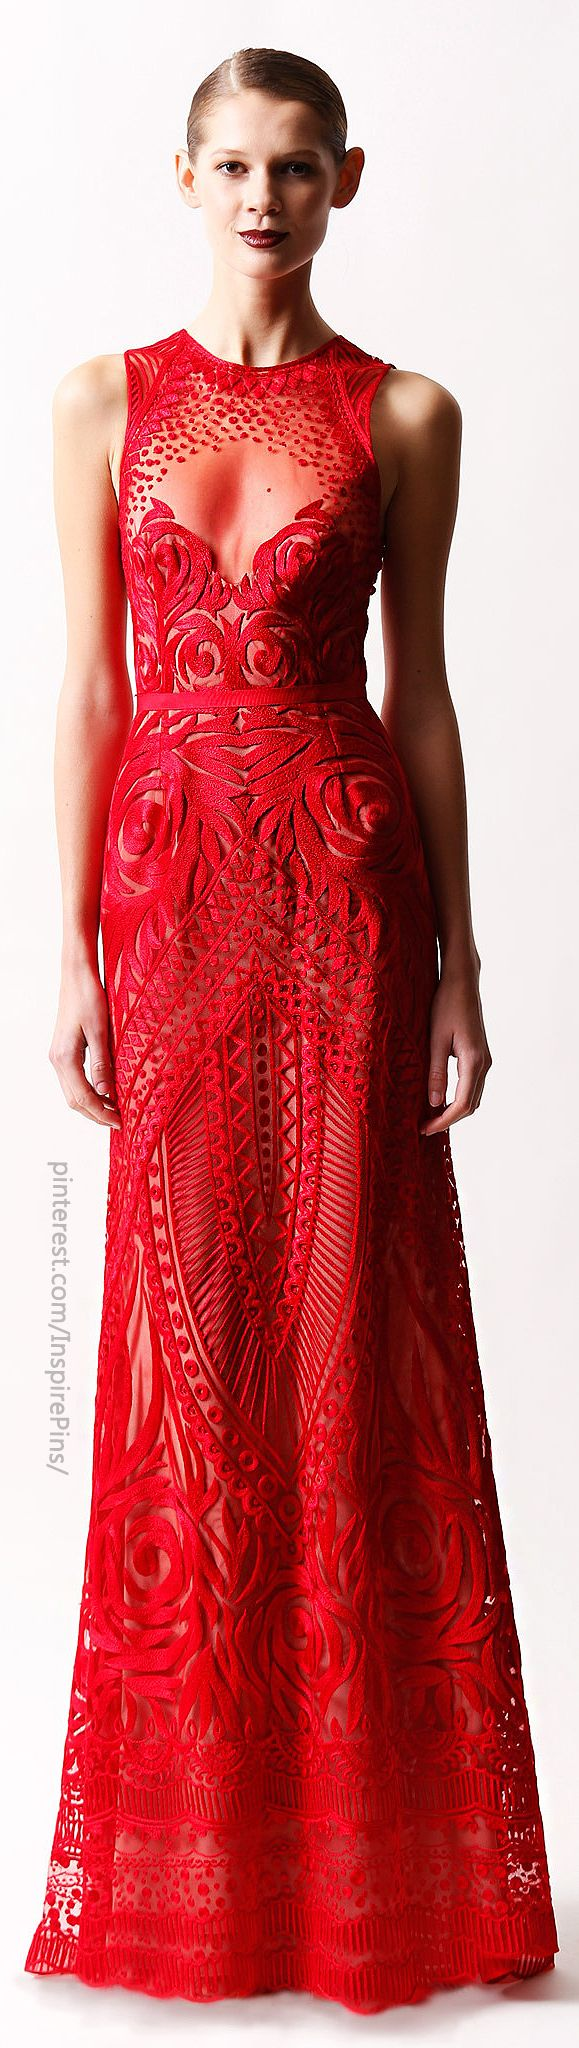 G i joe red dress quotes